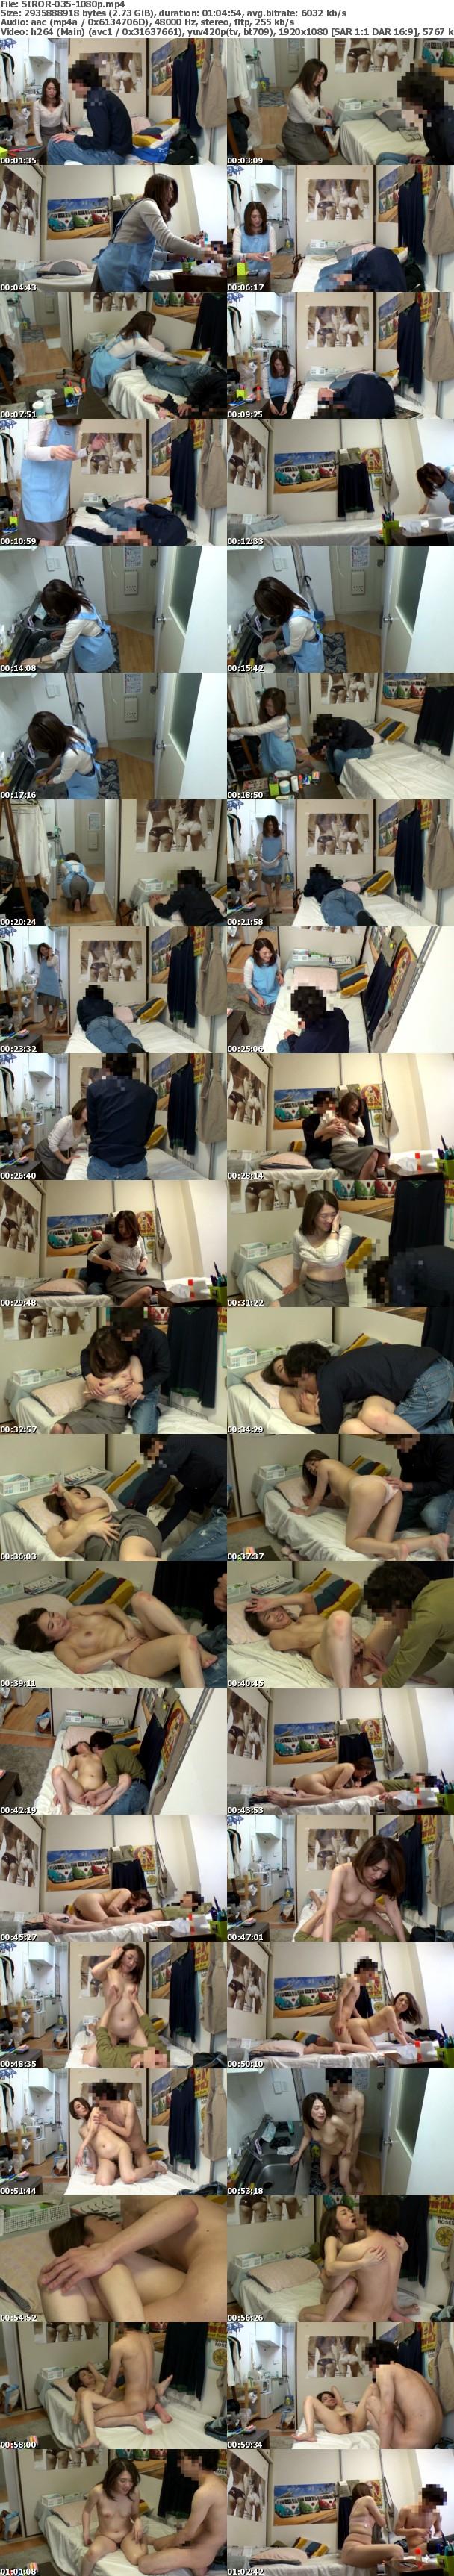 (Full HD) SIROR-035 レンタル熟女のお仕事~夫の知らない妻の裏の顔 file NO.35~